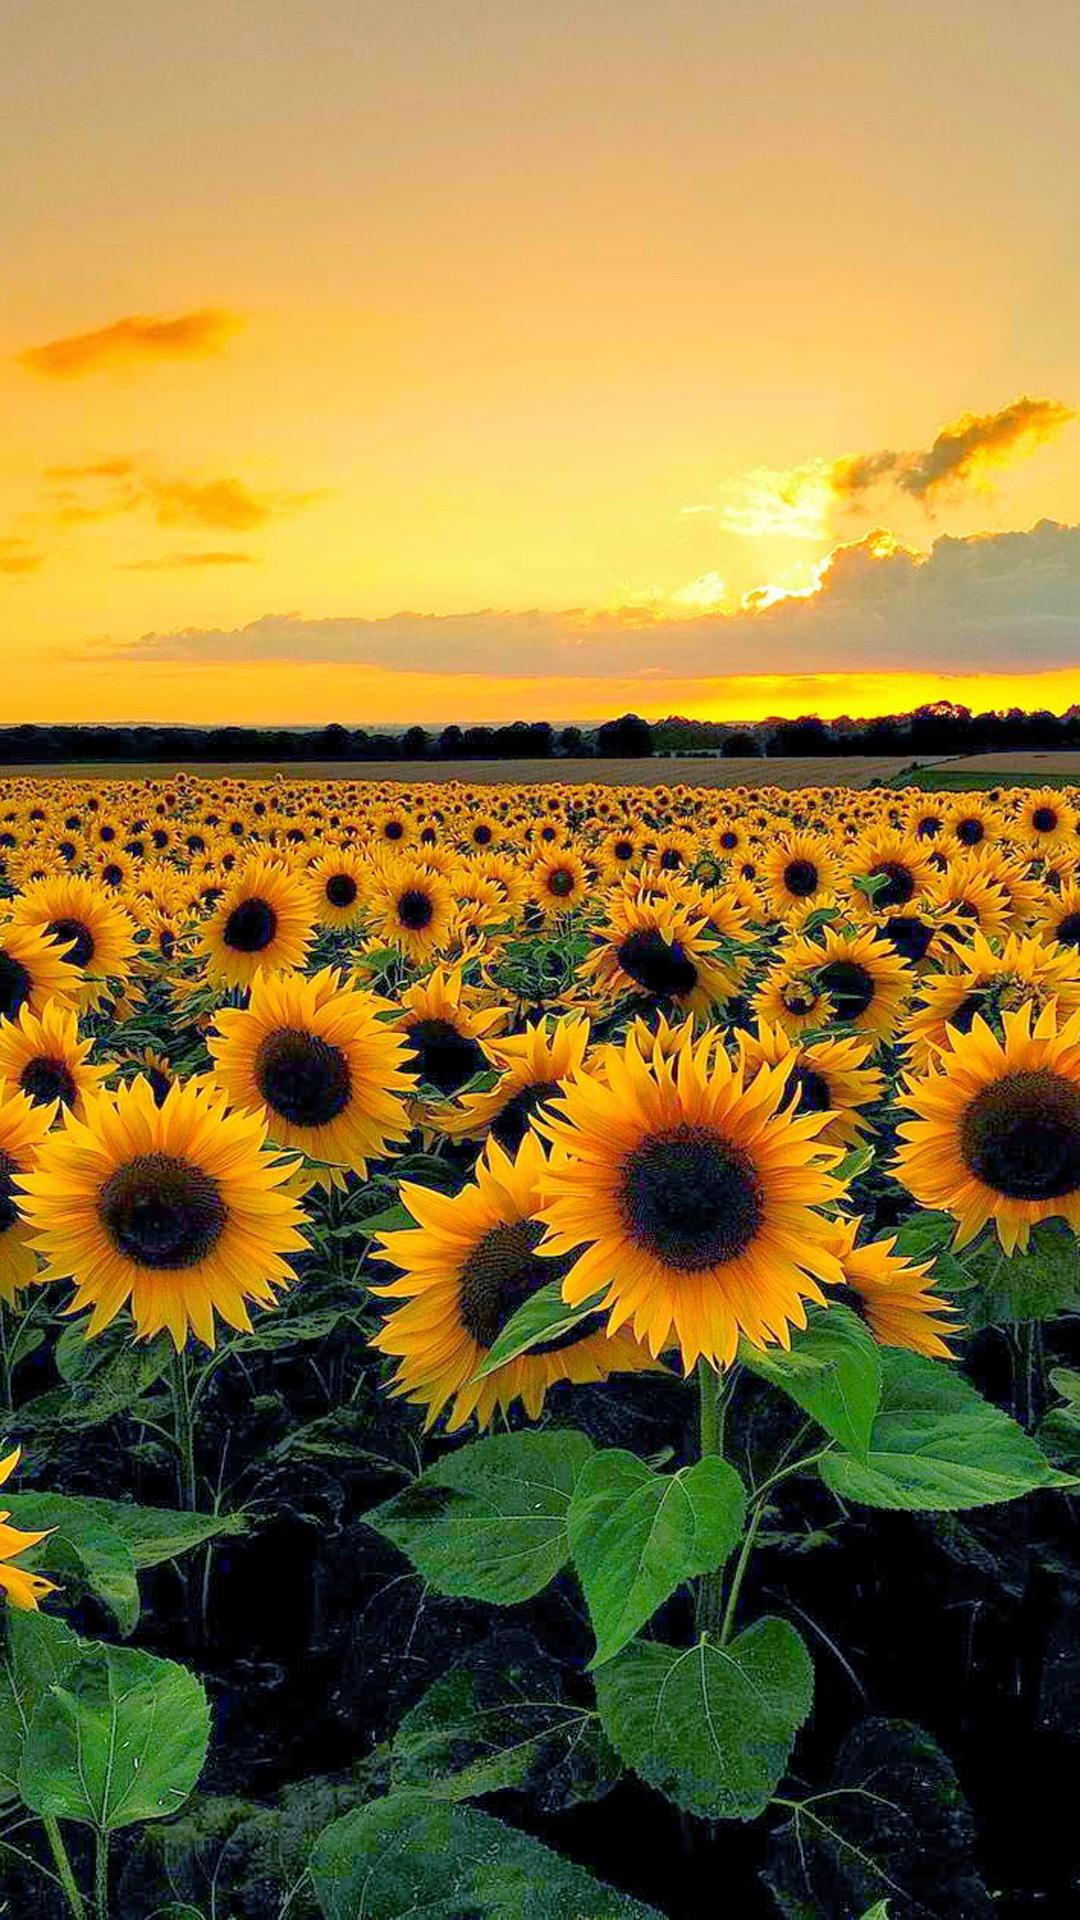 71] Sunflower Wallpapers on WallpaperSafari 1080x1920